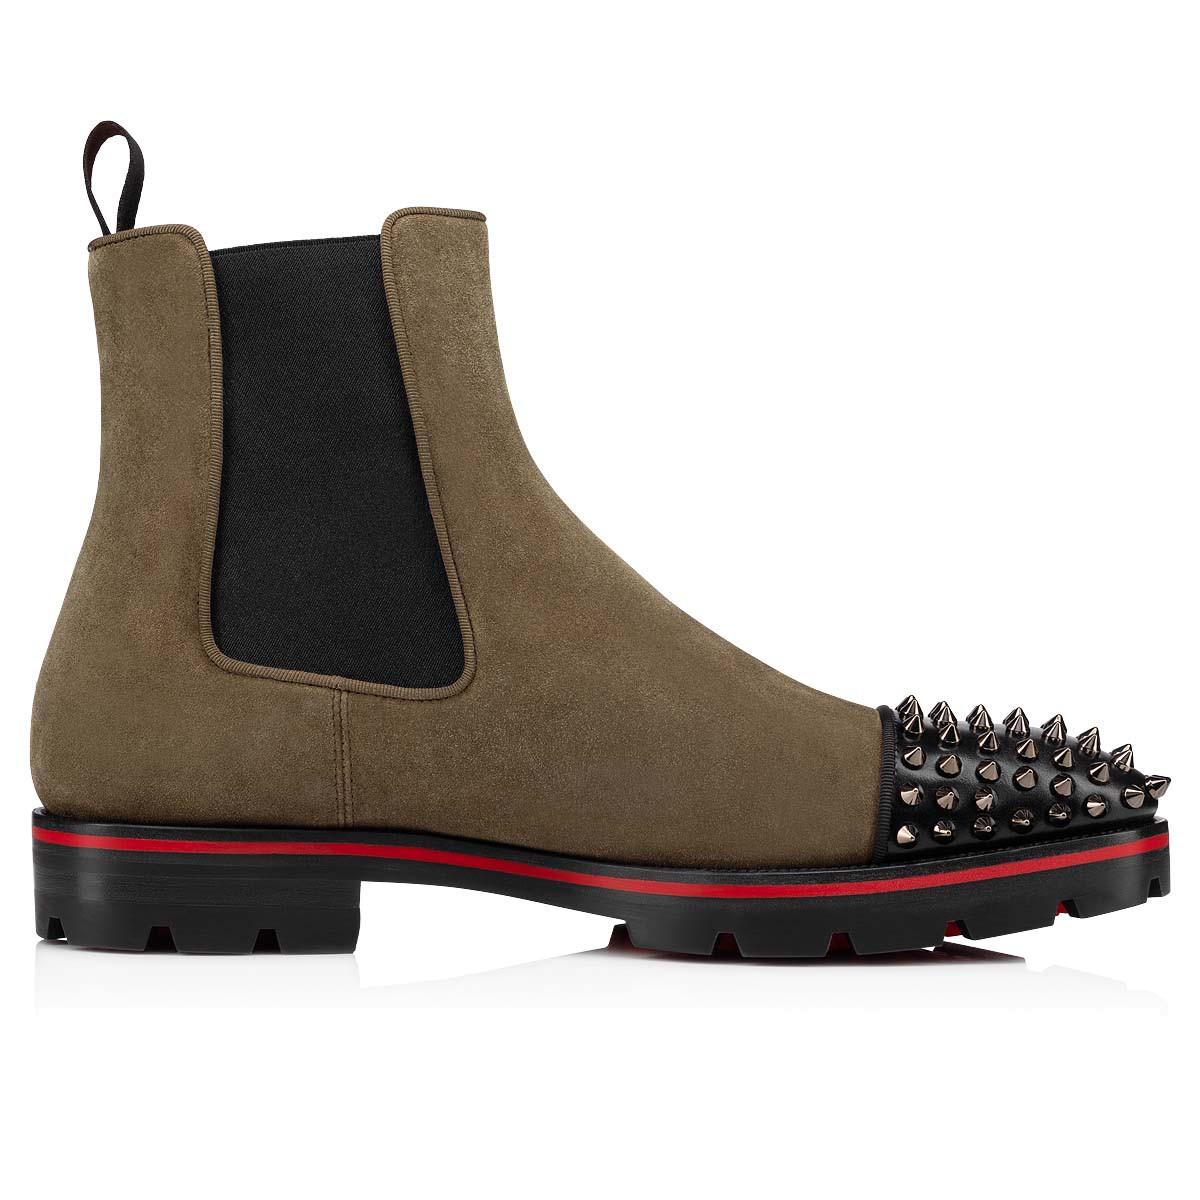 Shoes - Melon Spikes Flat - Christian Louboutin